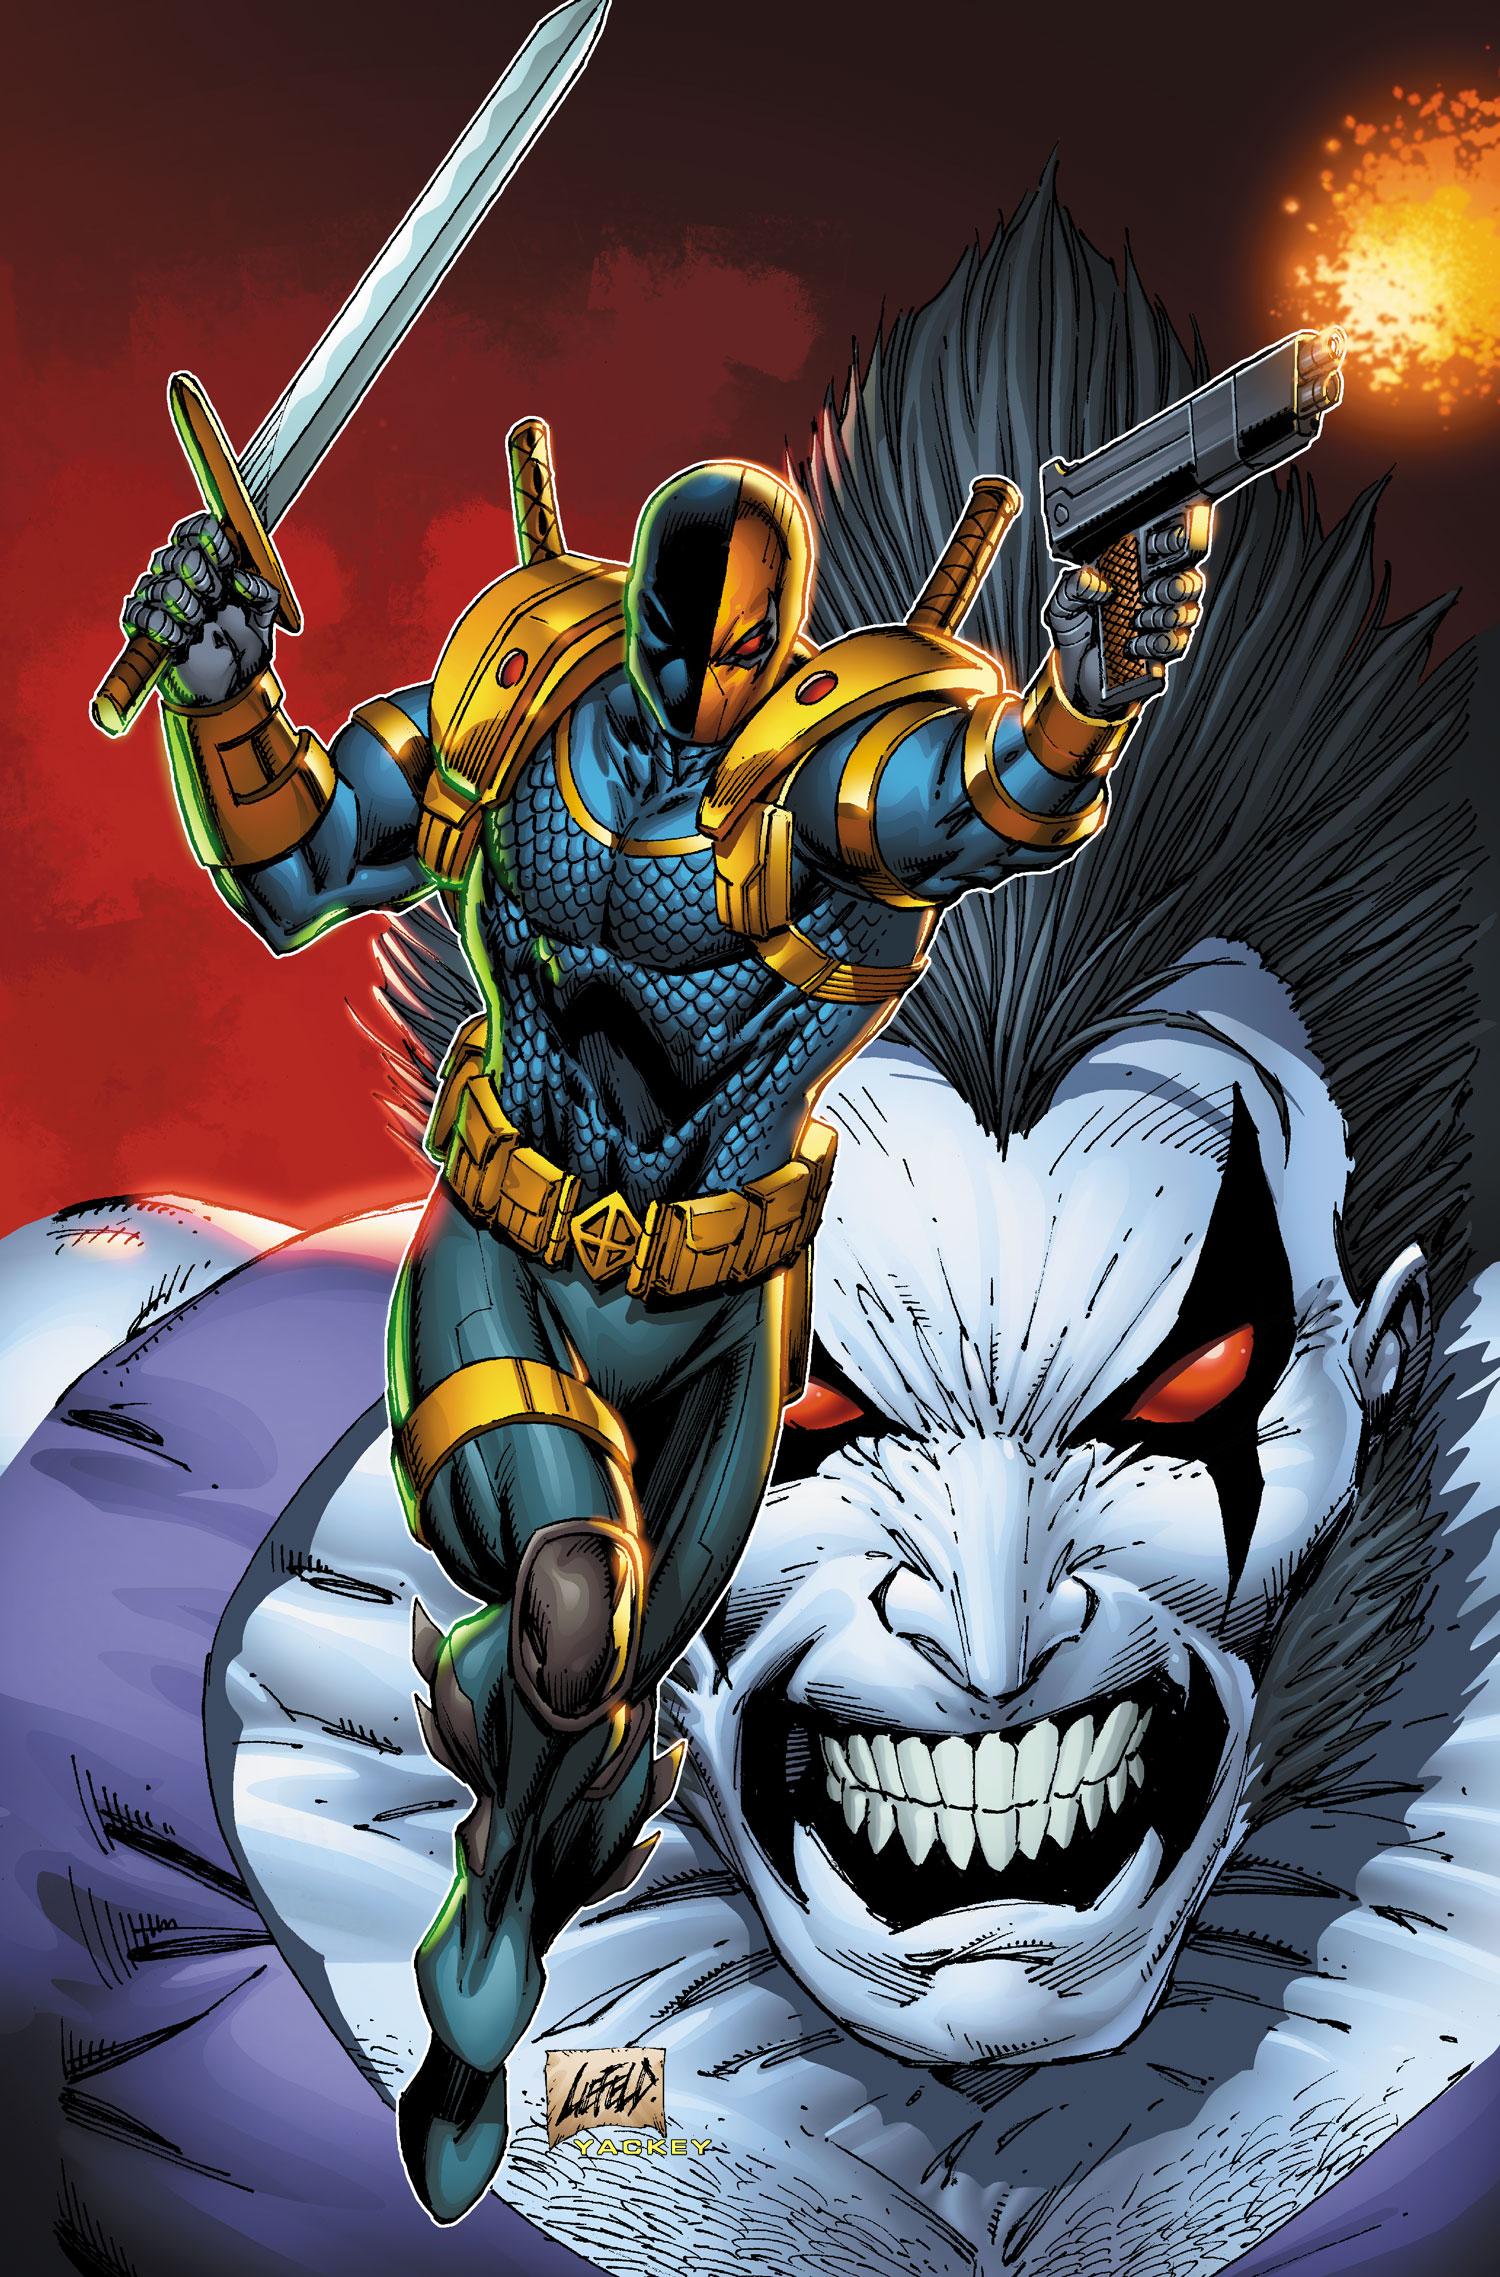 Deathstroke Vol 2 10 - DC Comics Database